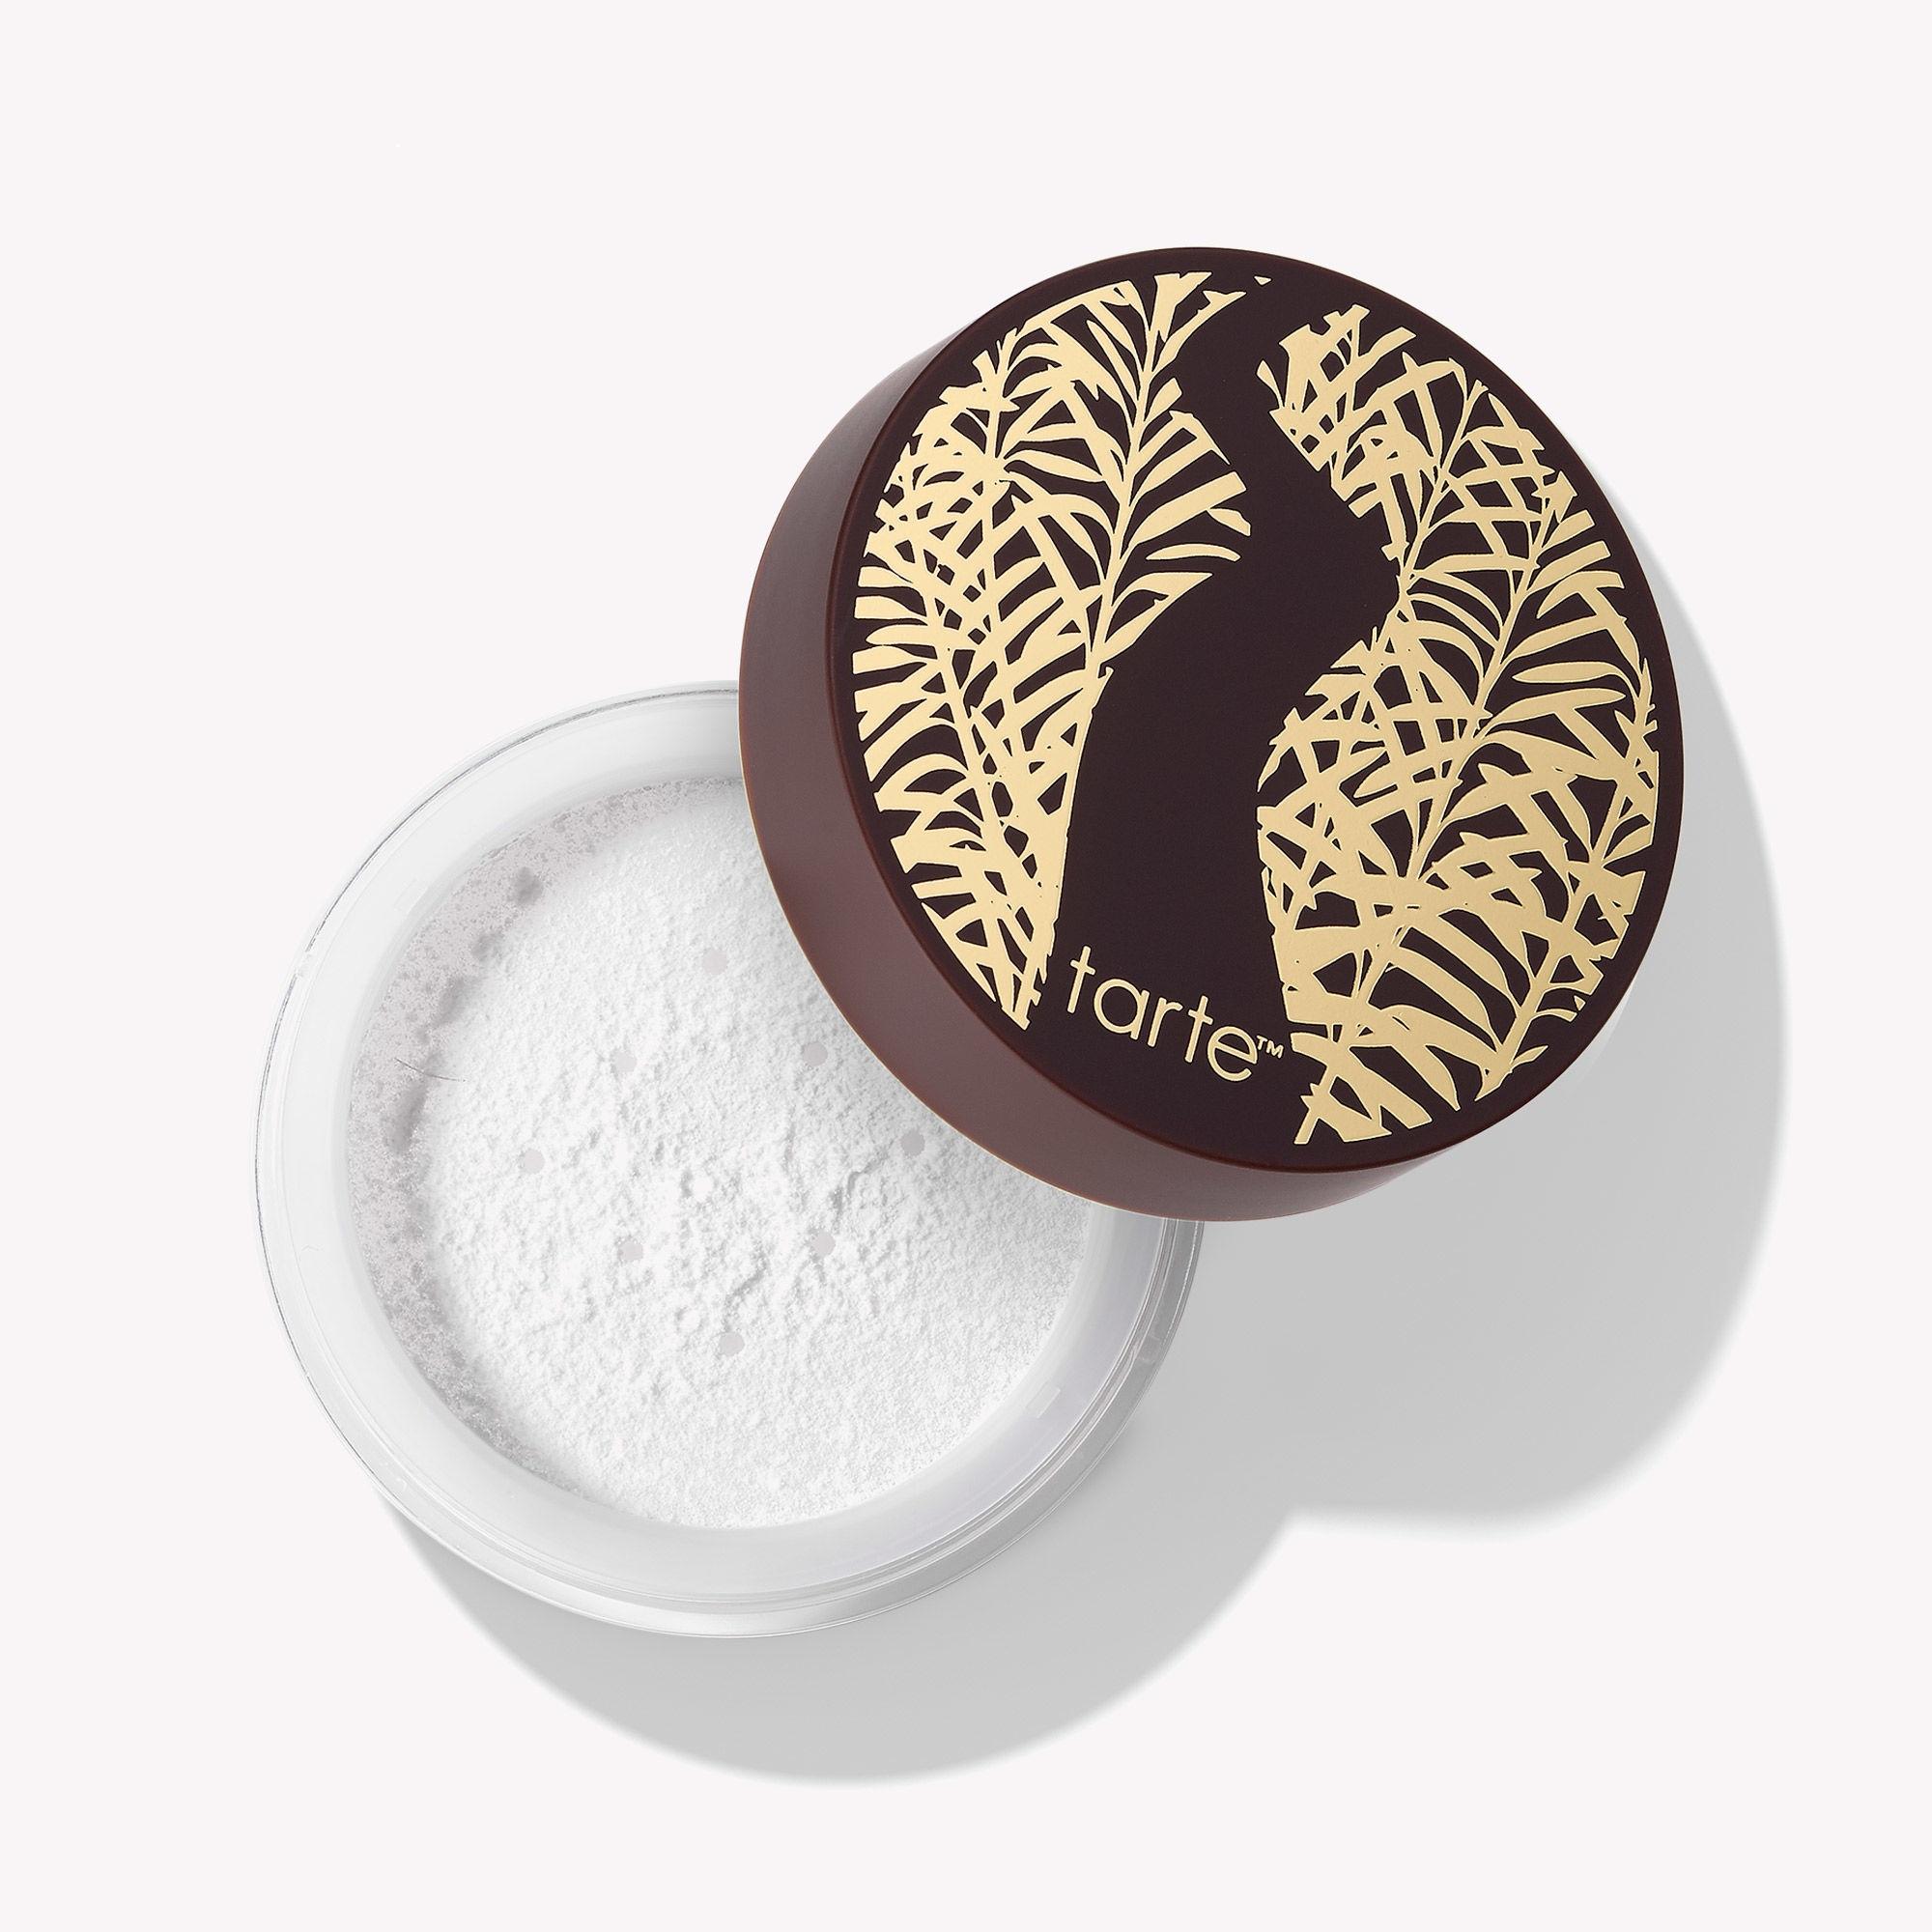 tarte™ smooth operator ™ Amazonian clay finishing powder